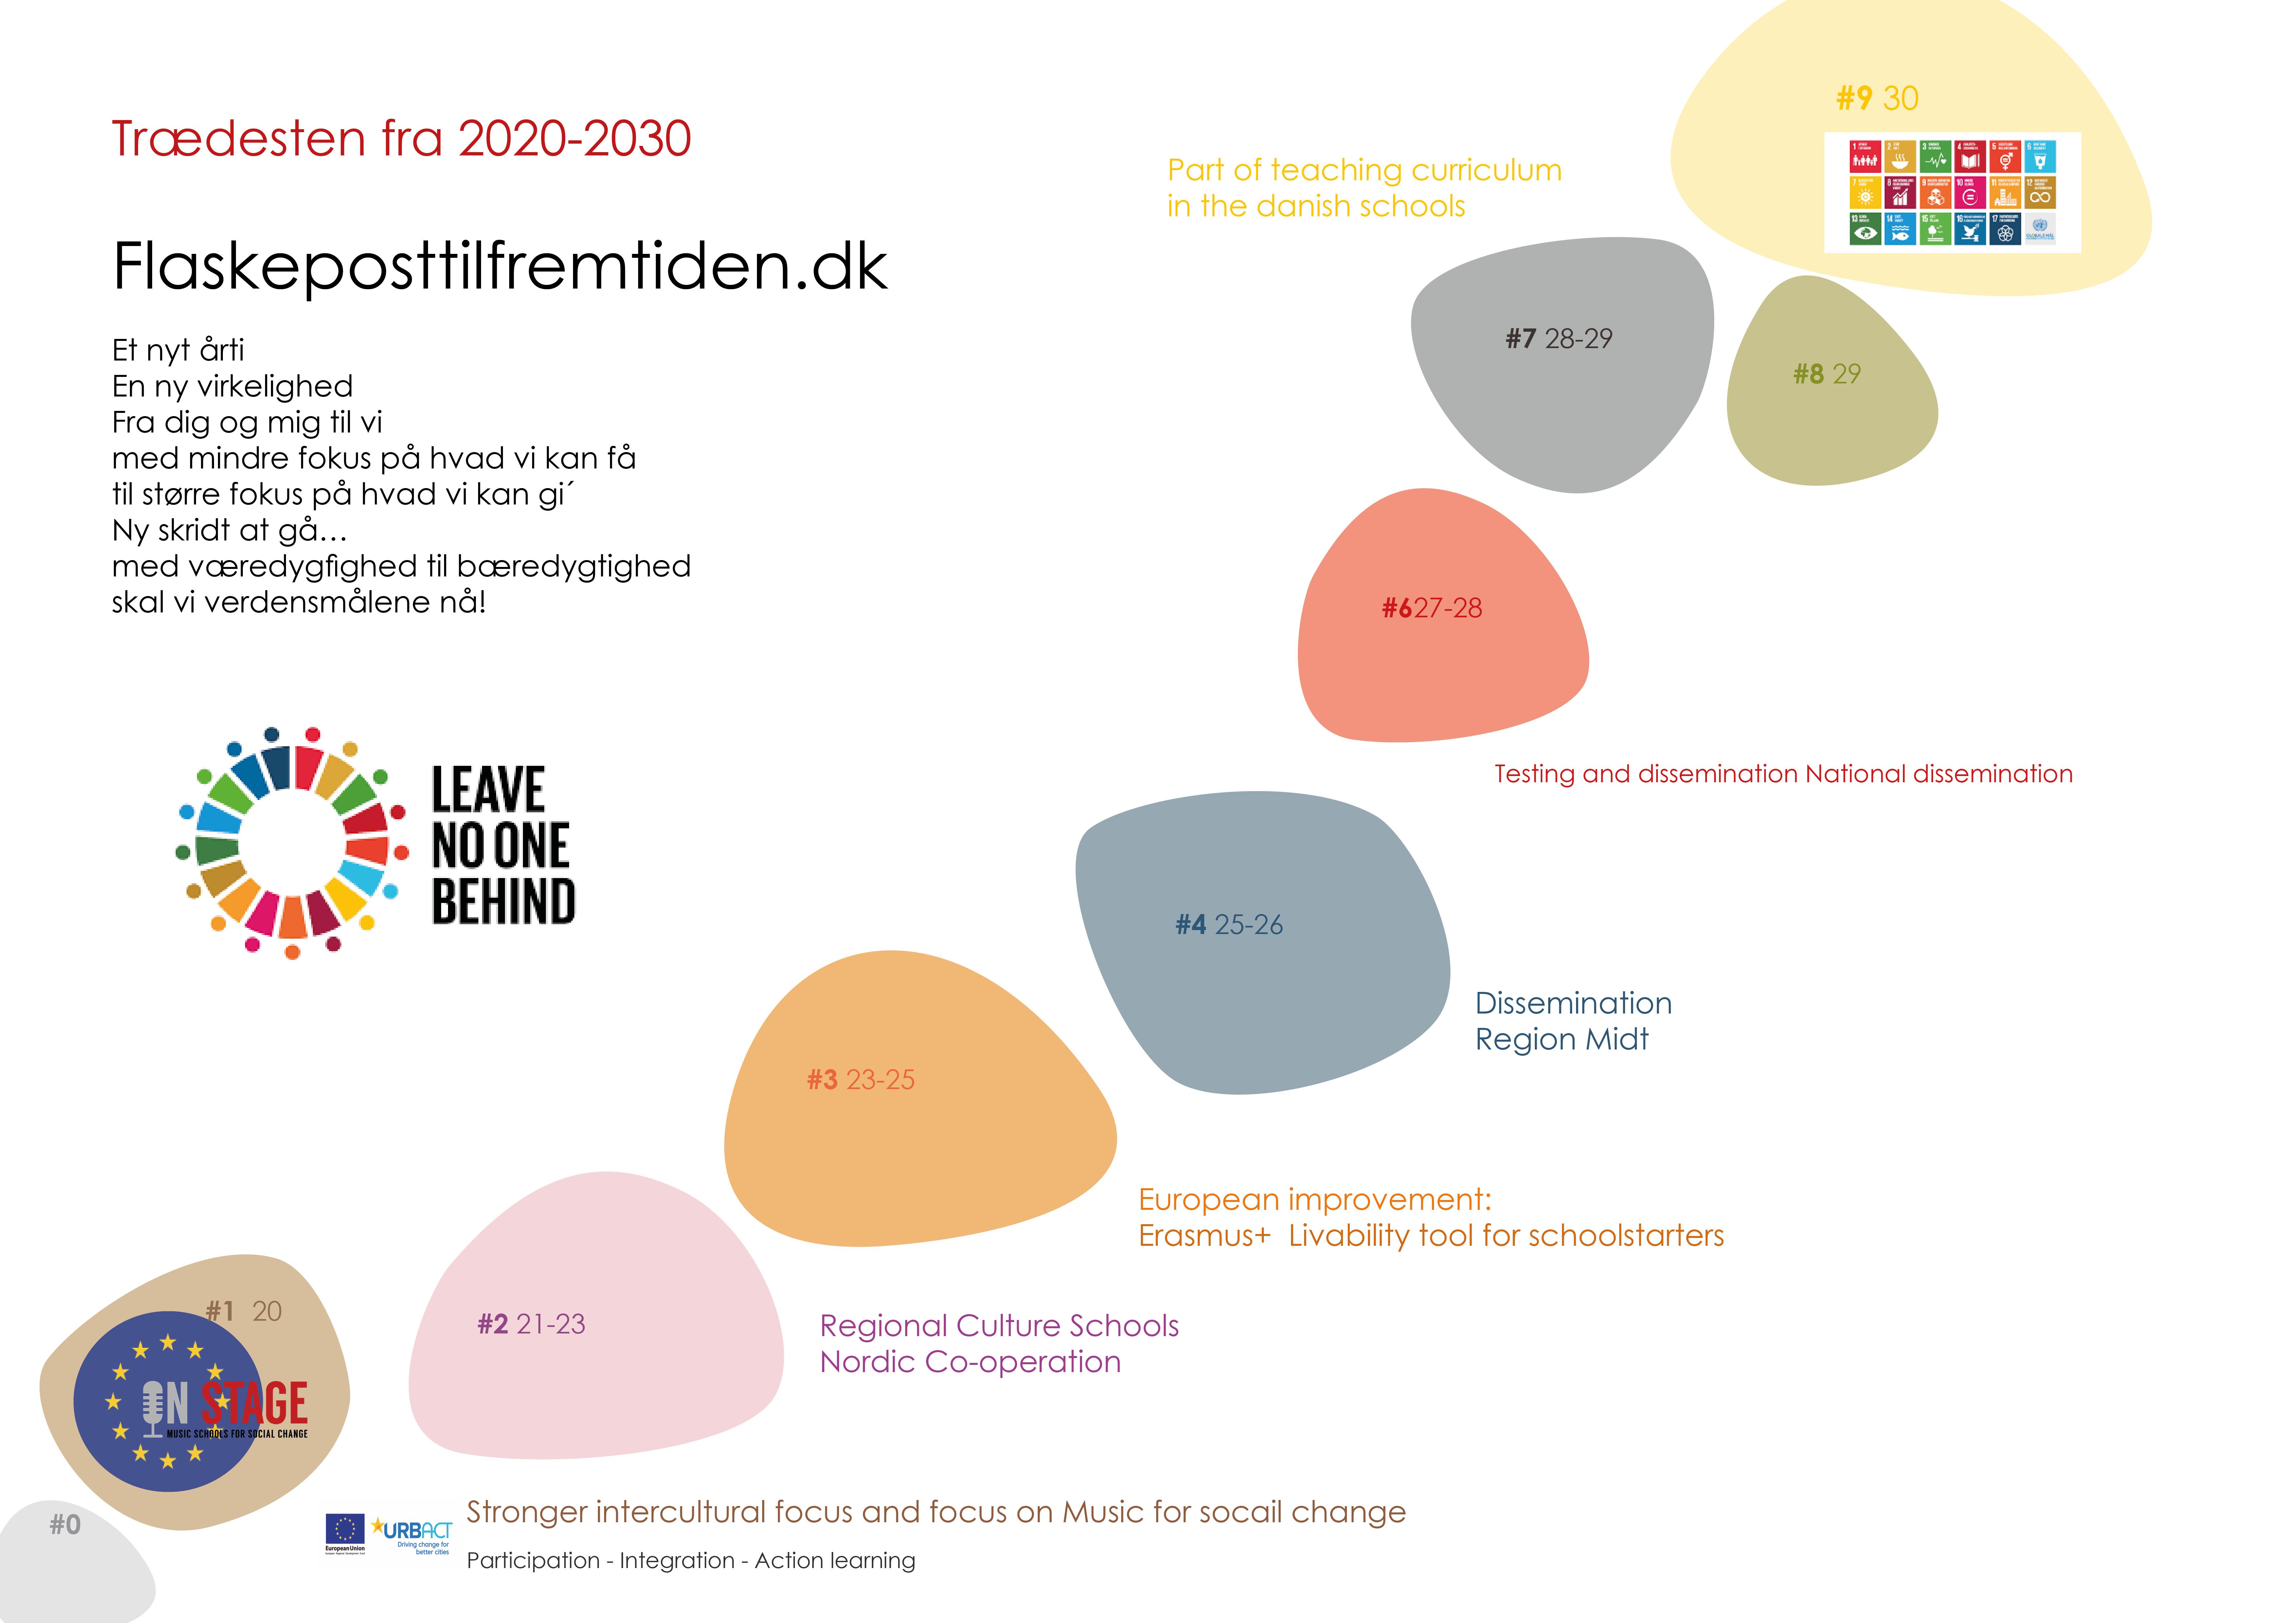 Trædesten 2020-2030